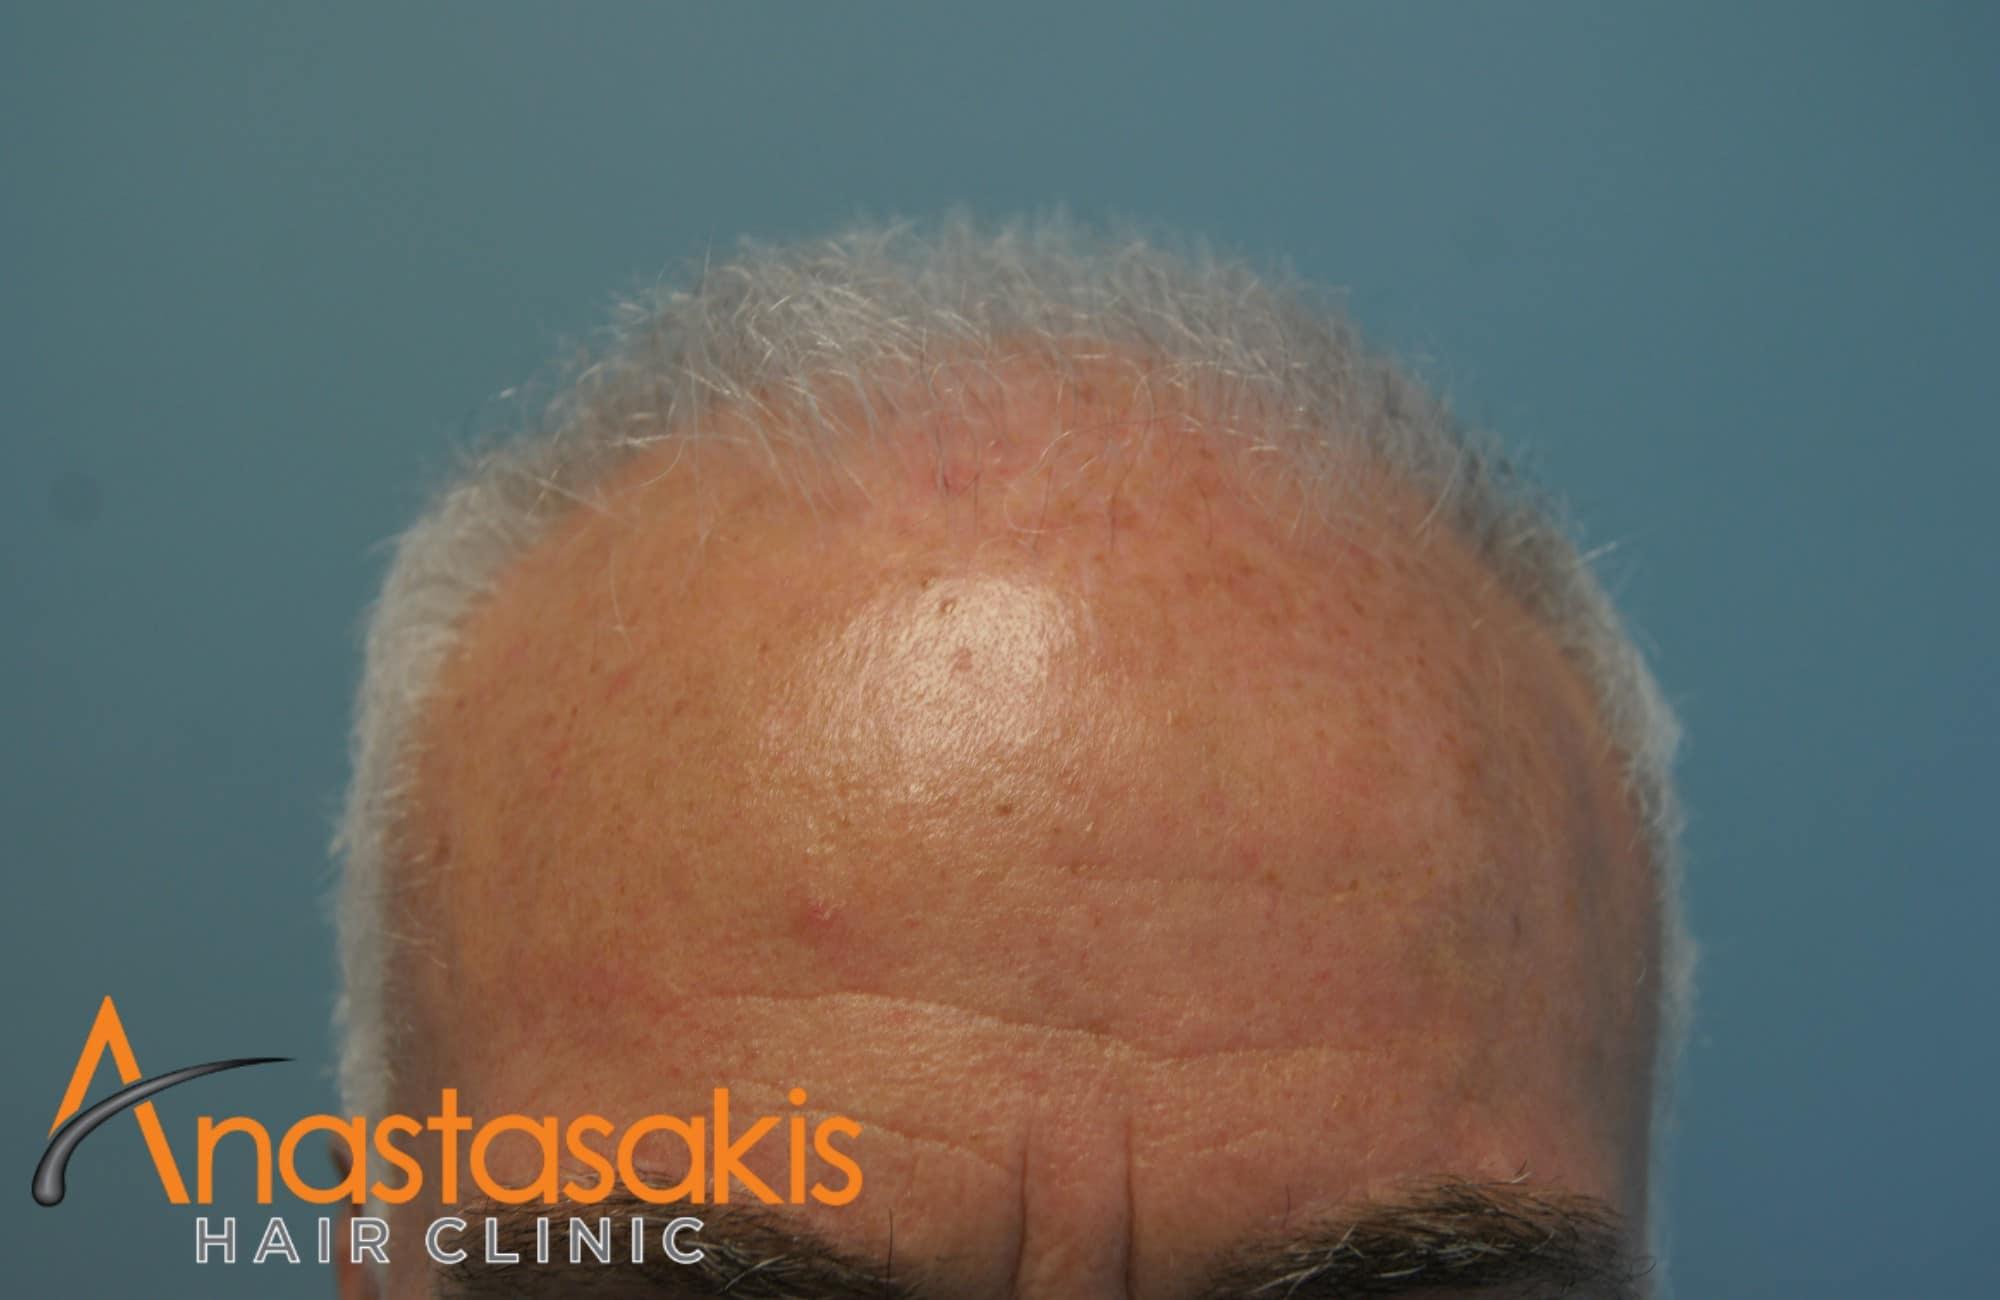 hairline ασθενή πριν τη εμφύτευση μαλλιών με 3500 fus